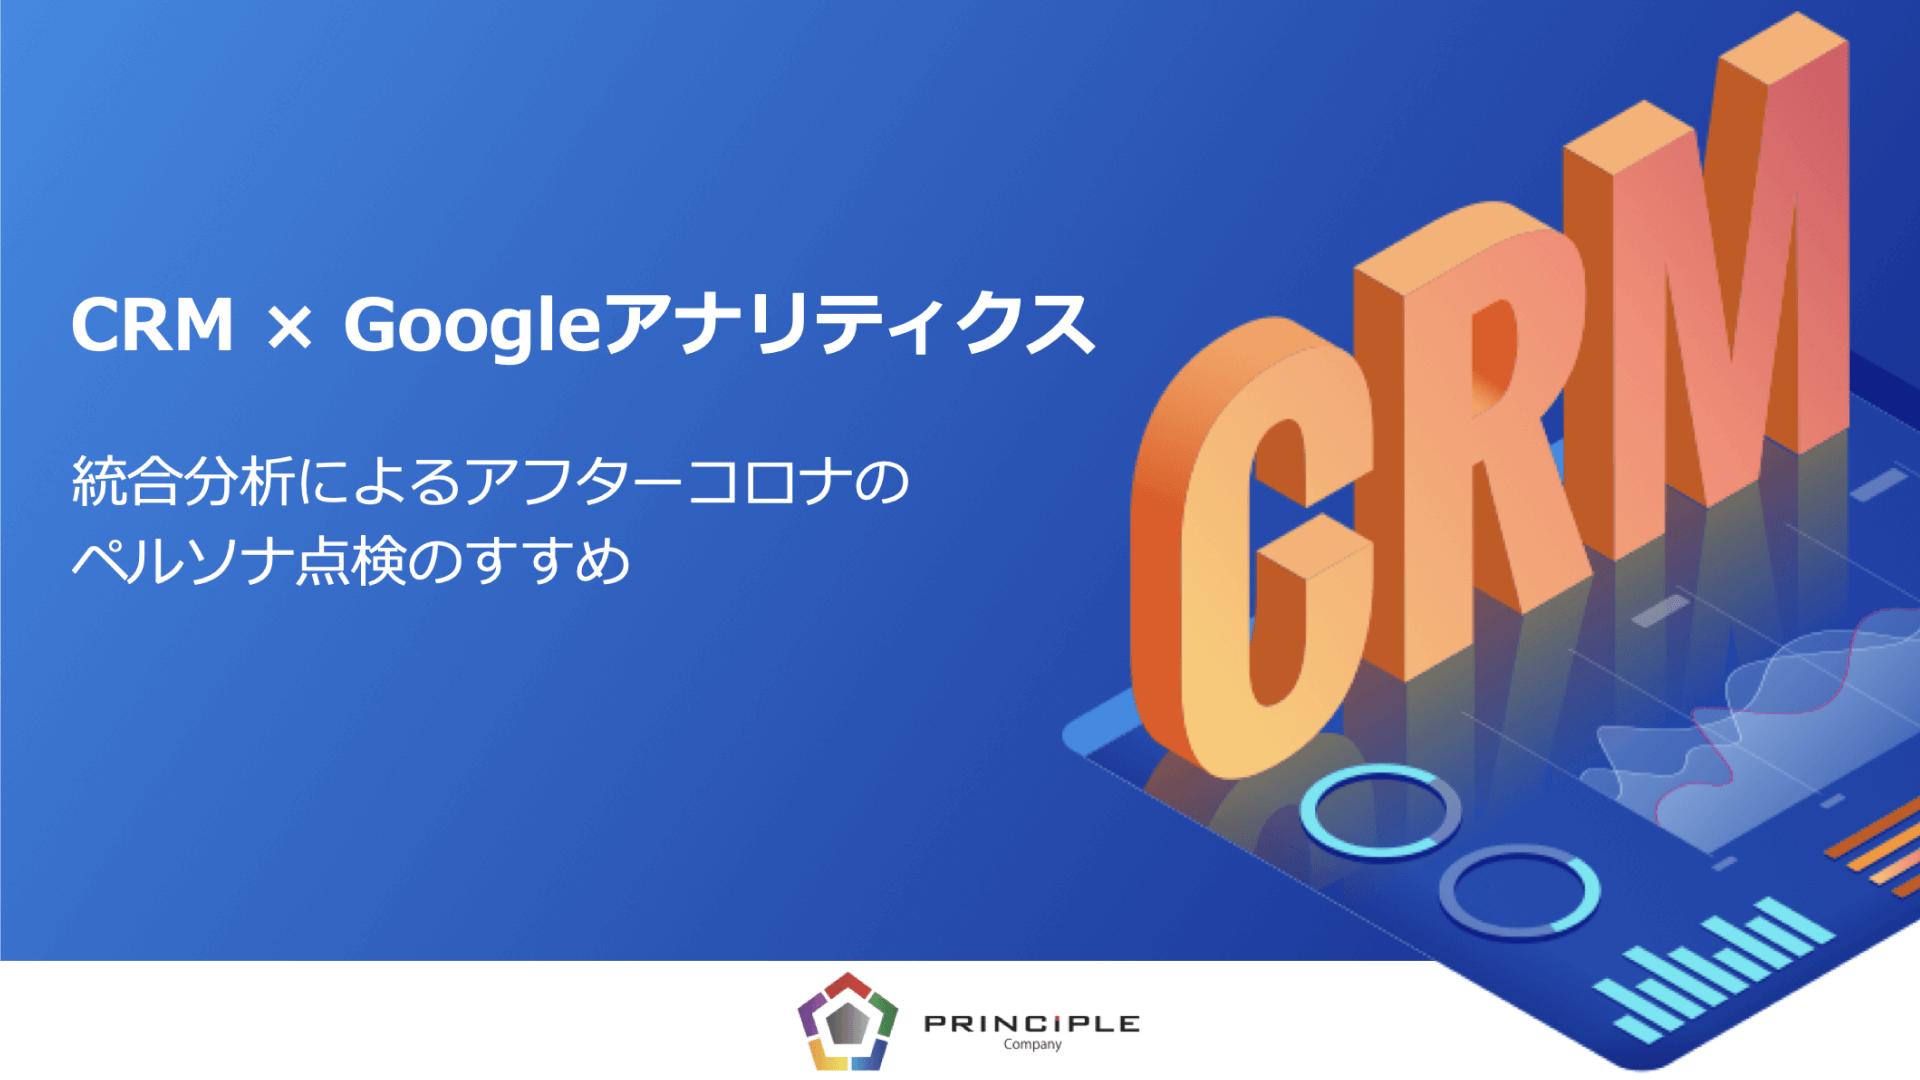 CRM × Googleアナリティクス 統合分析によるアフターコロナのペルソナ点検のすすめ